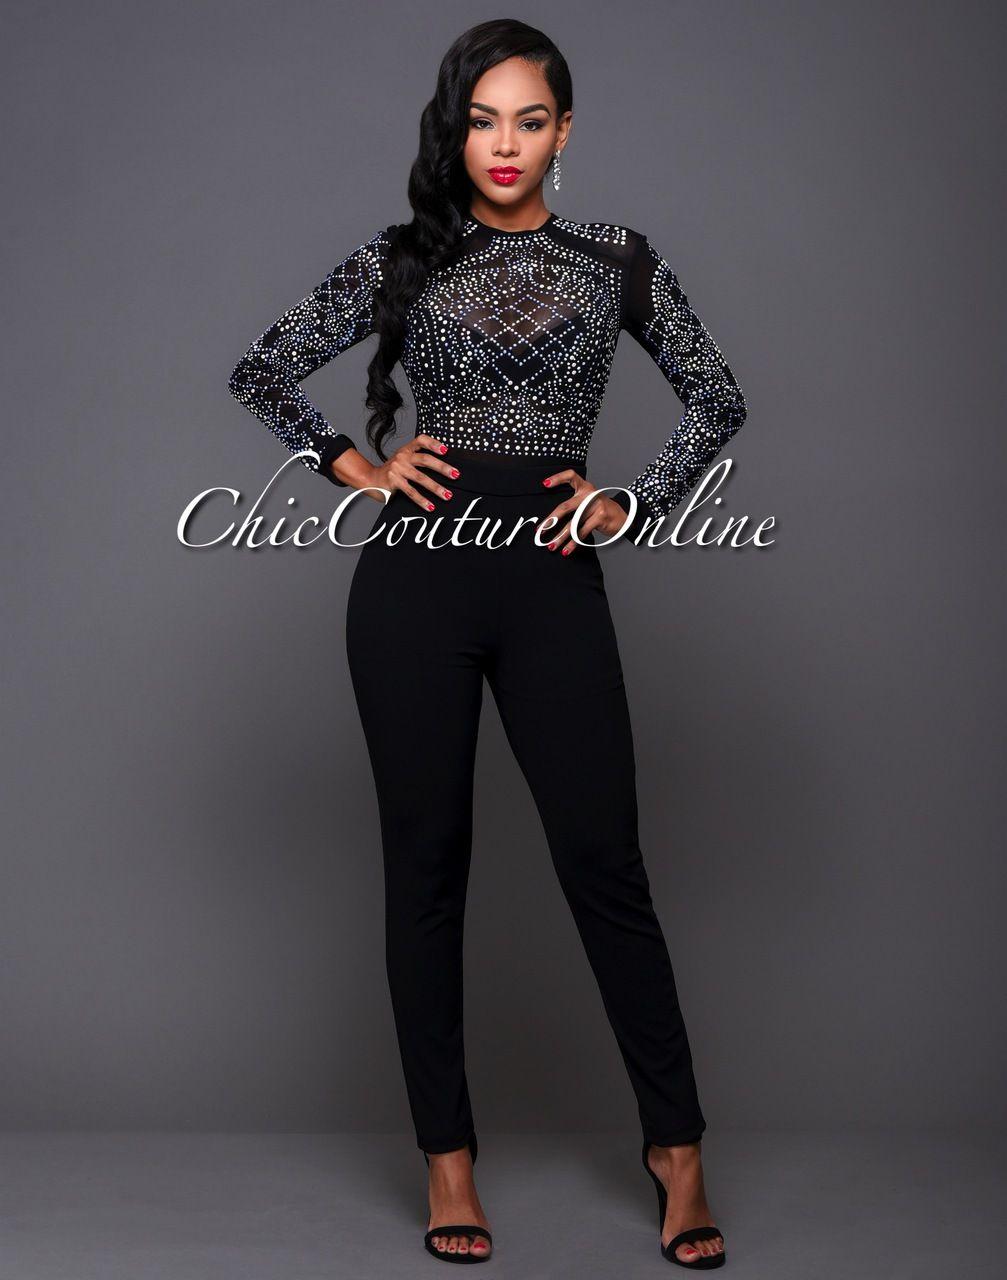 Lace bodysuit high neck  Chic Couture Online  After Party Black Iridescent Stones Jumpsuit